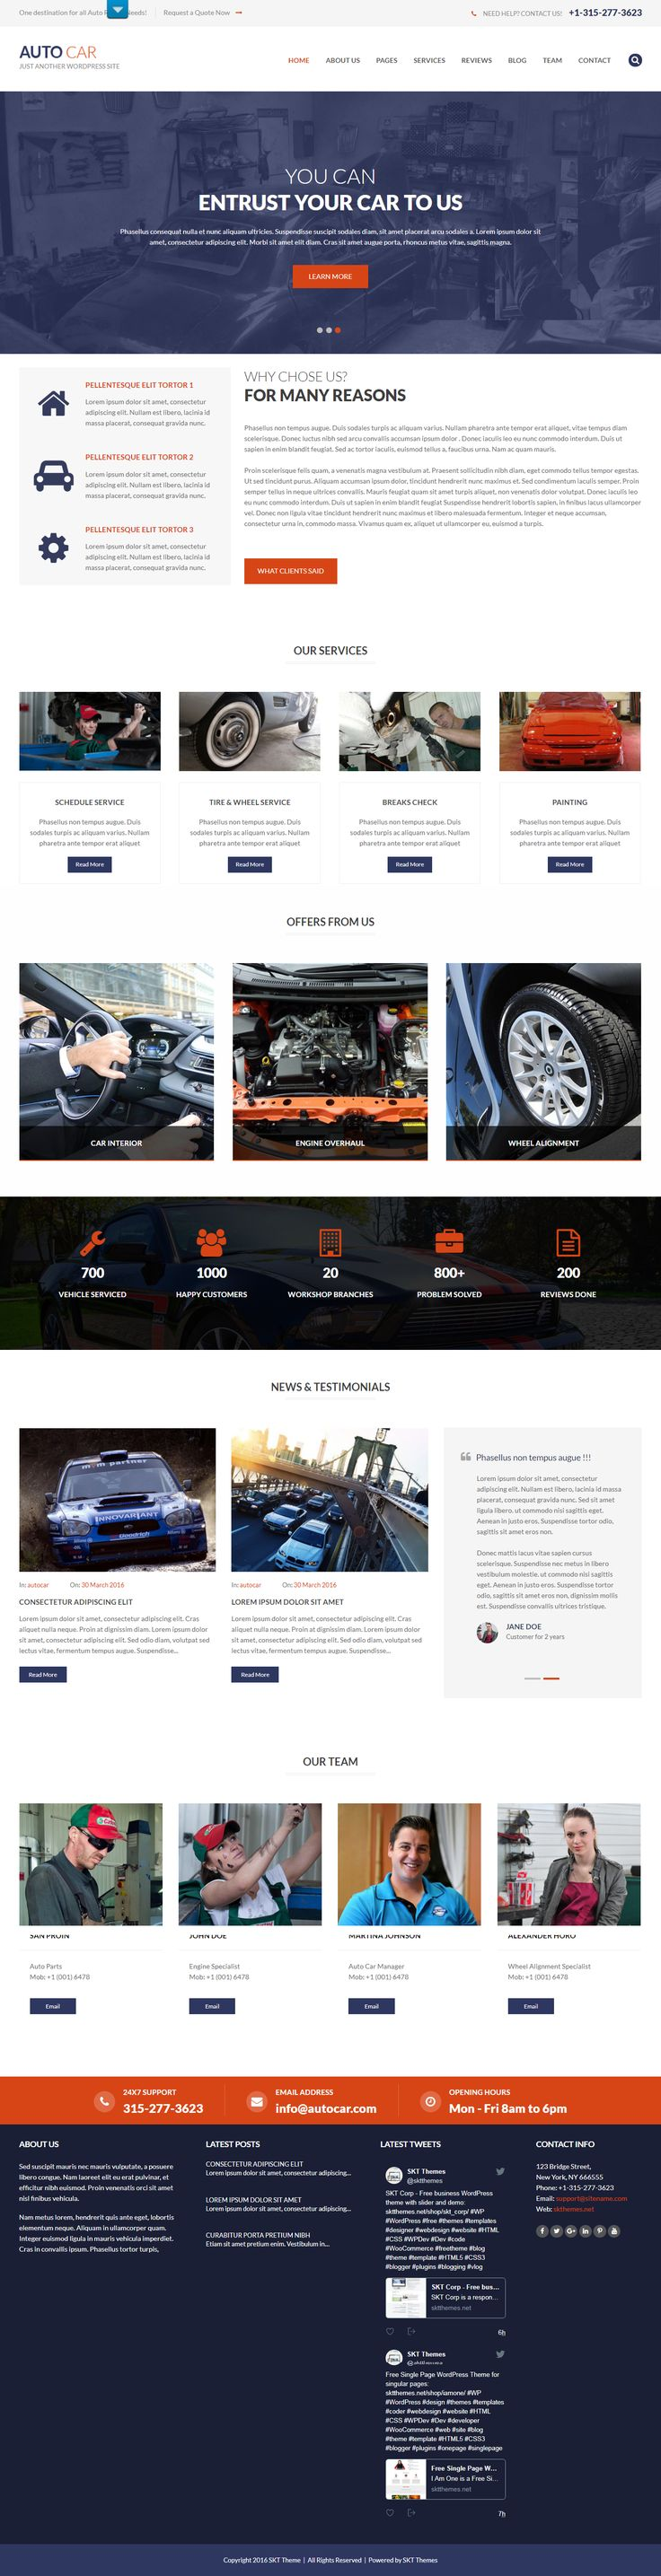 Free Mechanic WordPress Themes for Car Repair Websites